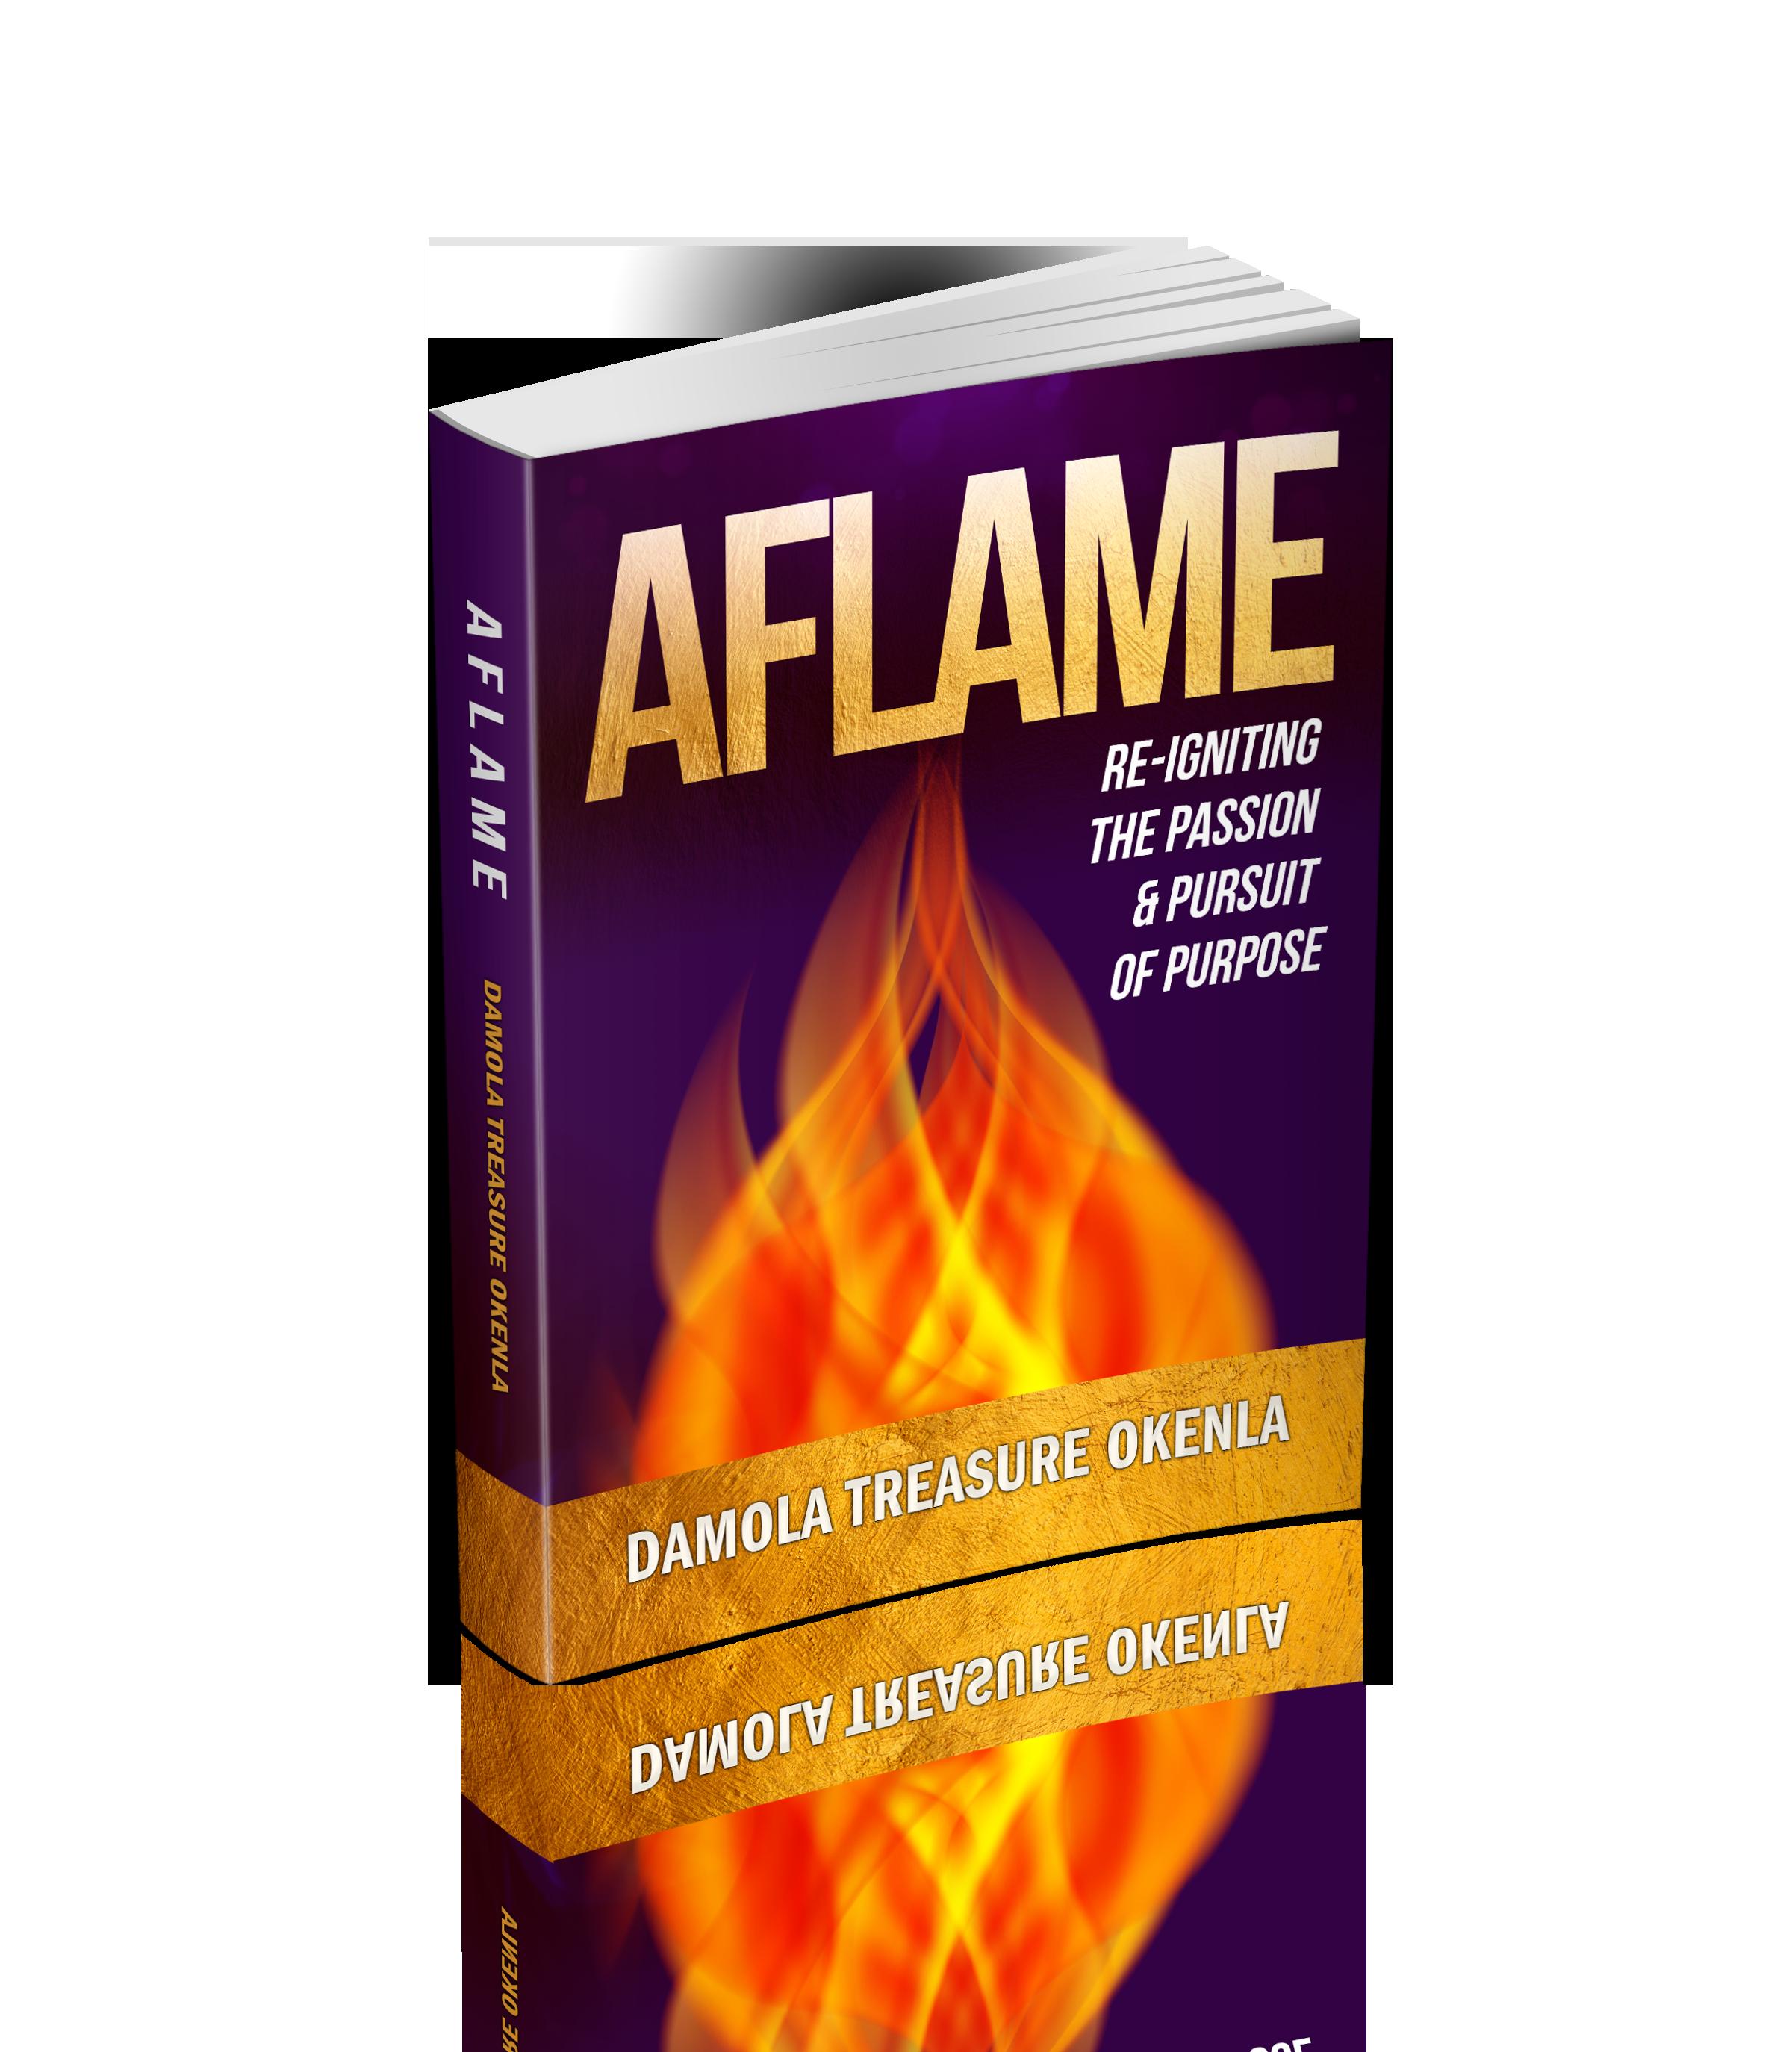 Aflame by Damola Treasure Okenla